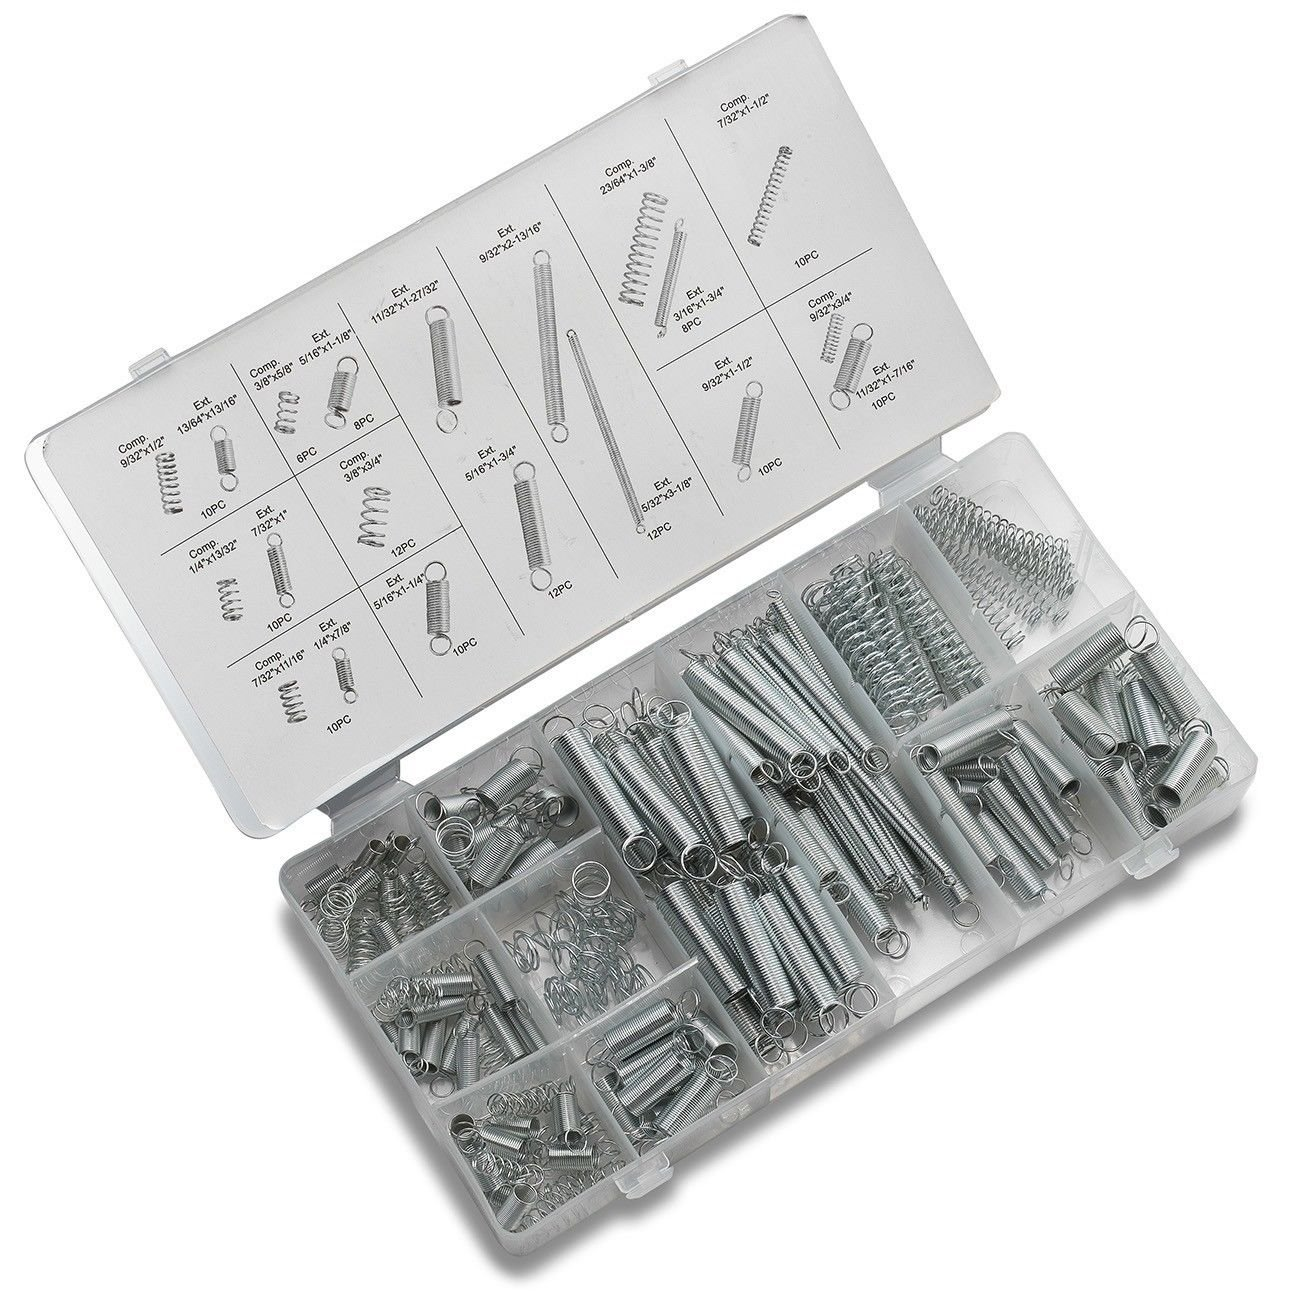 200 Small Metal Loose Steel Coil Springs Assortment Kit